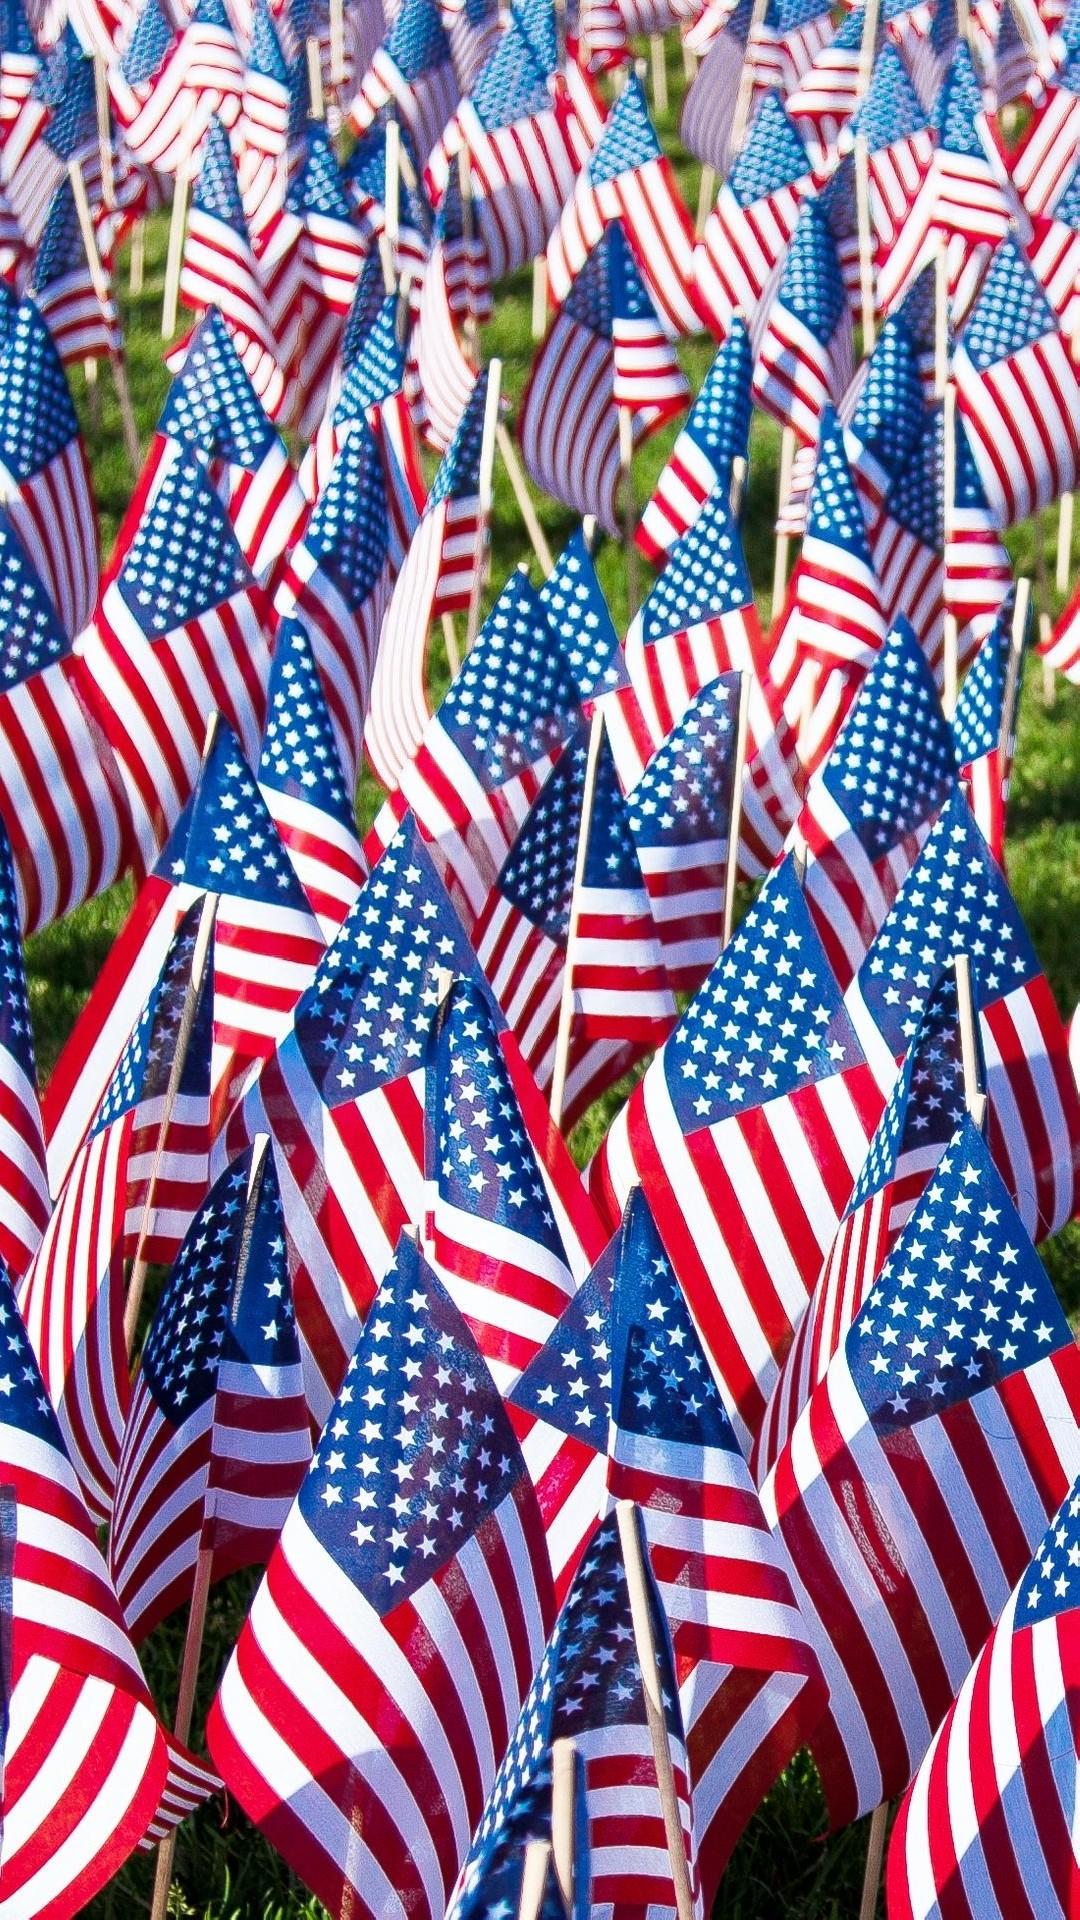 Iphone wallpaper American flags …